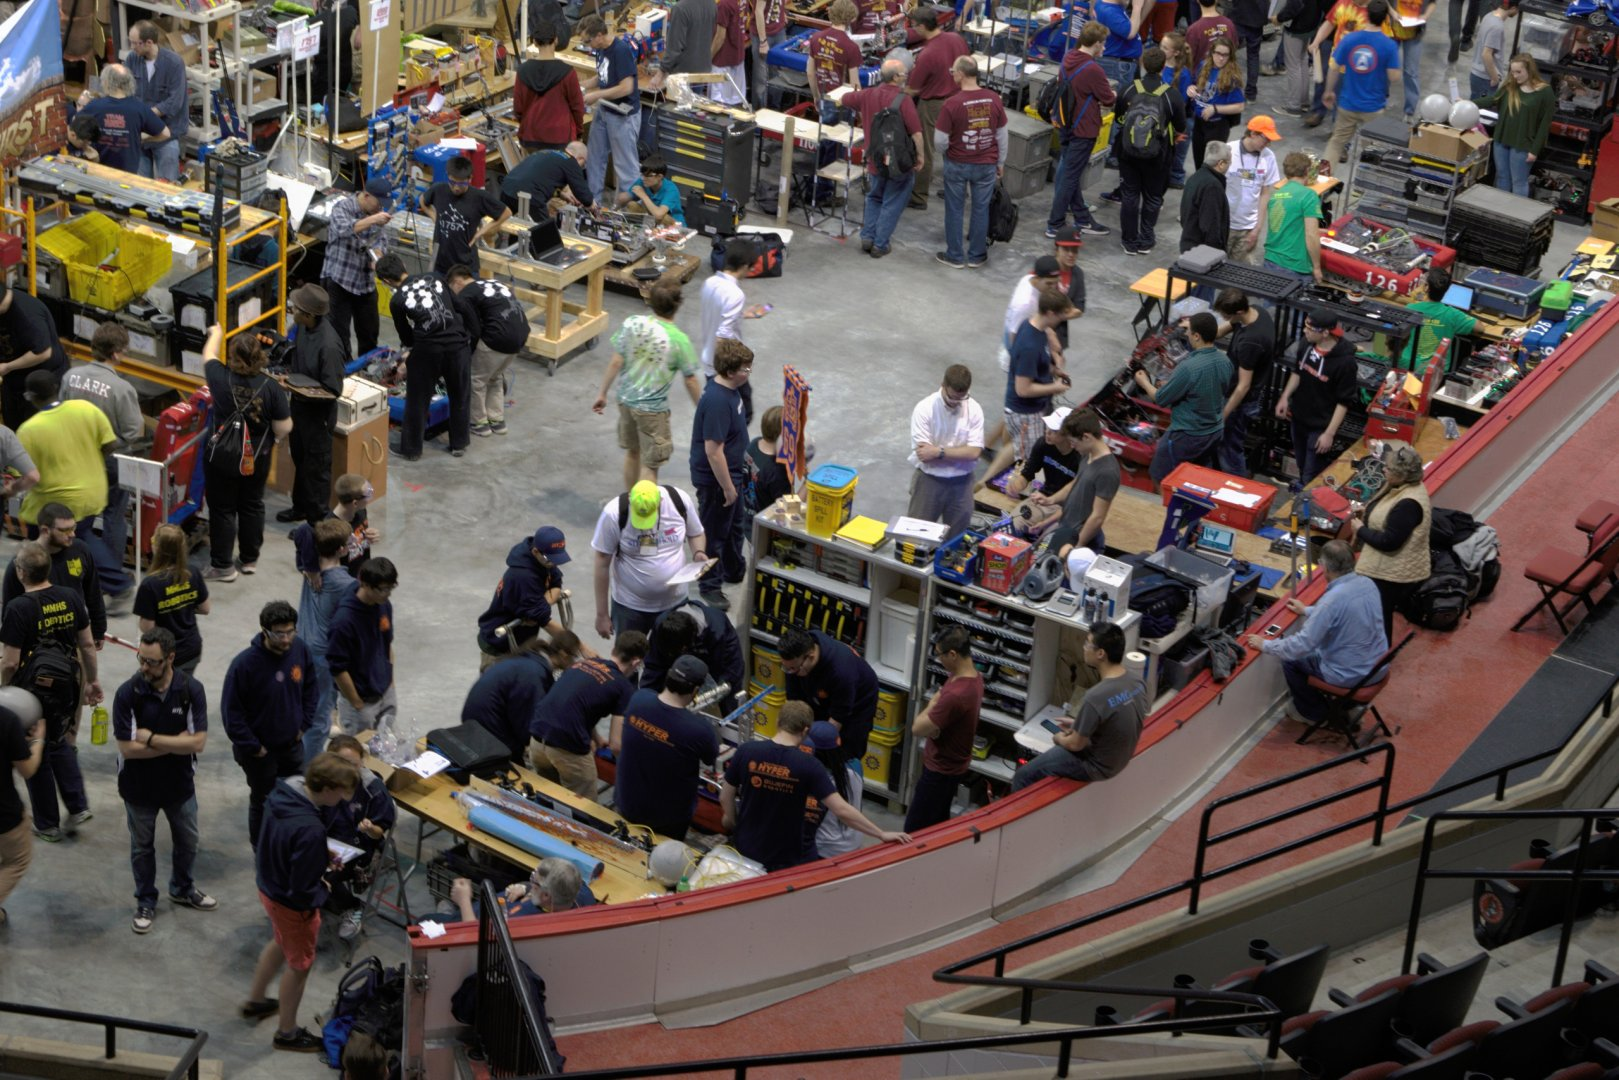 016.Boston FIRST Robotics Competition 04-03-2016.jpg